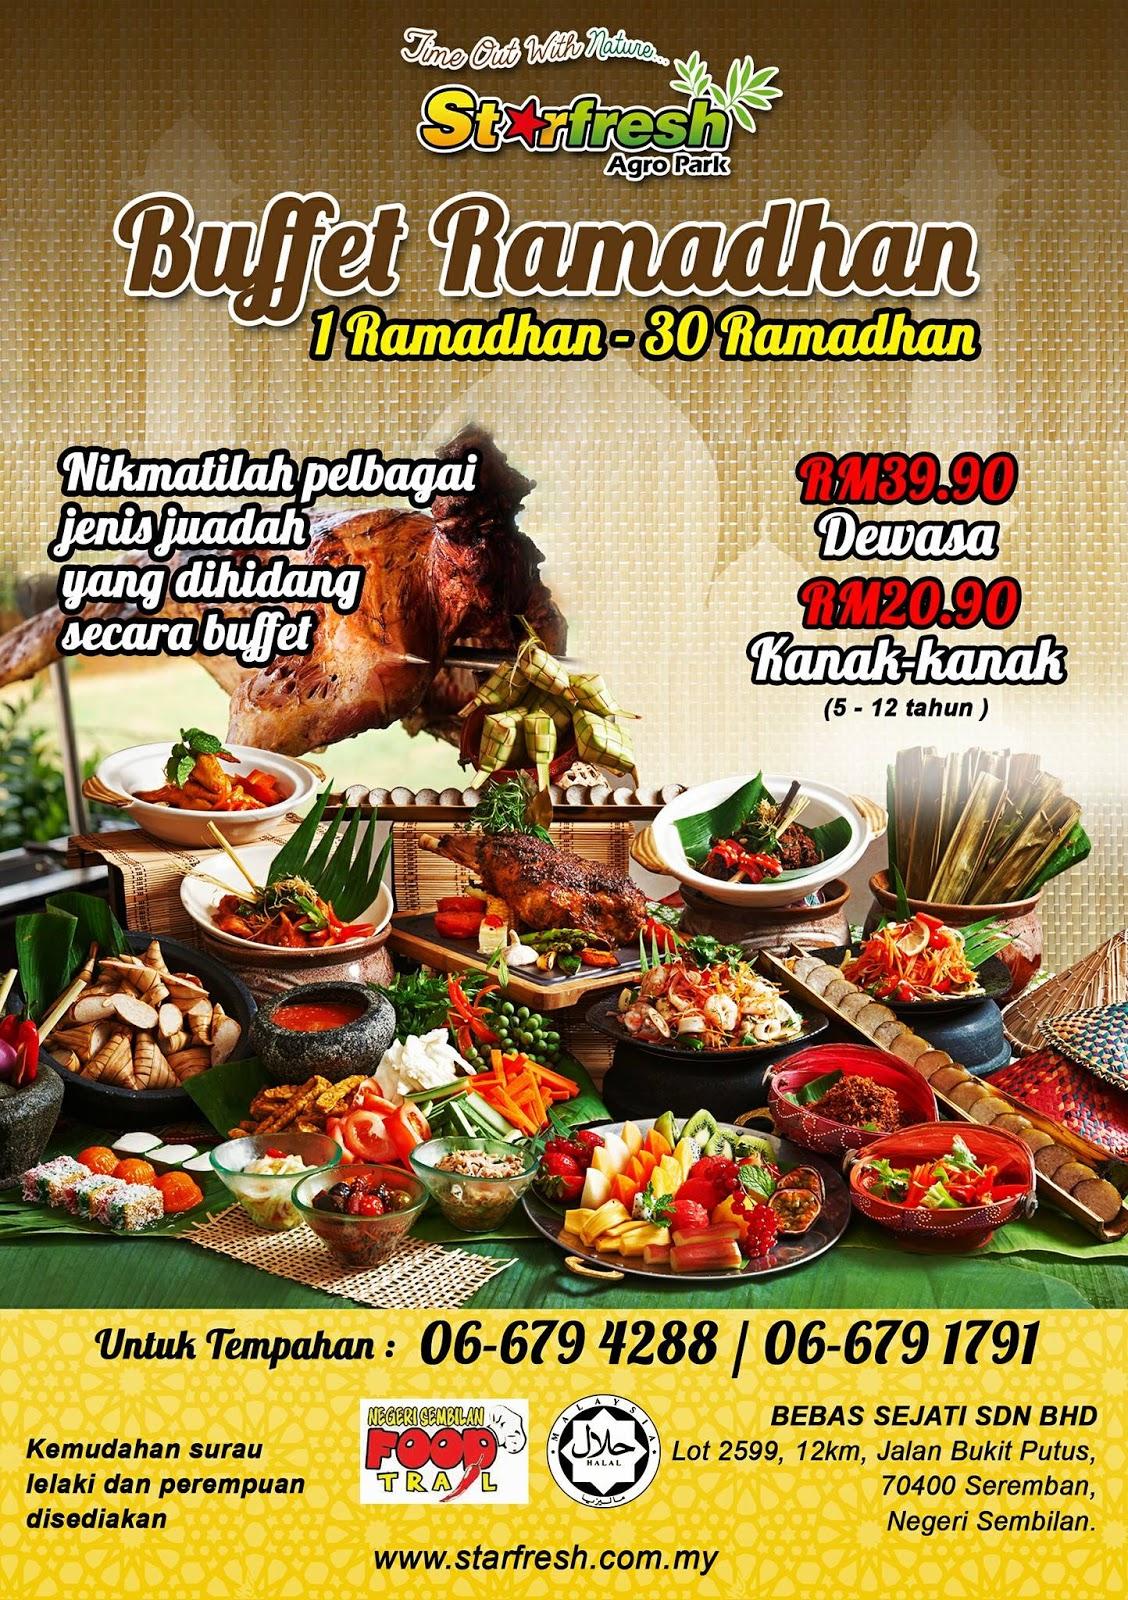 Buffet Ramadhan starftresh agropark Negeri Sembilan 2017